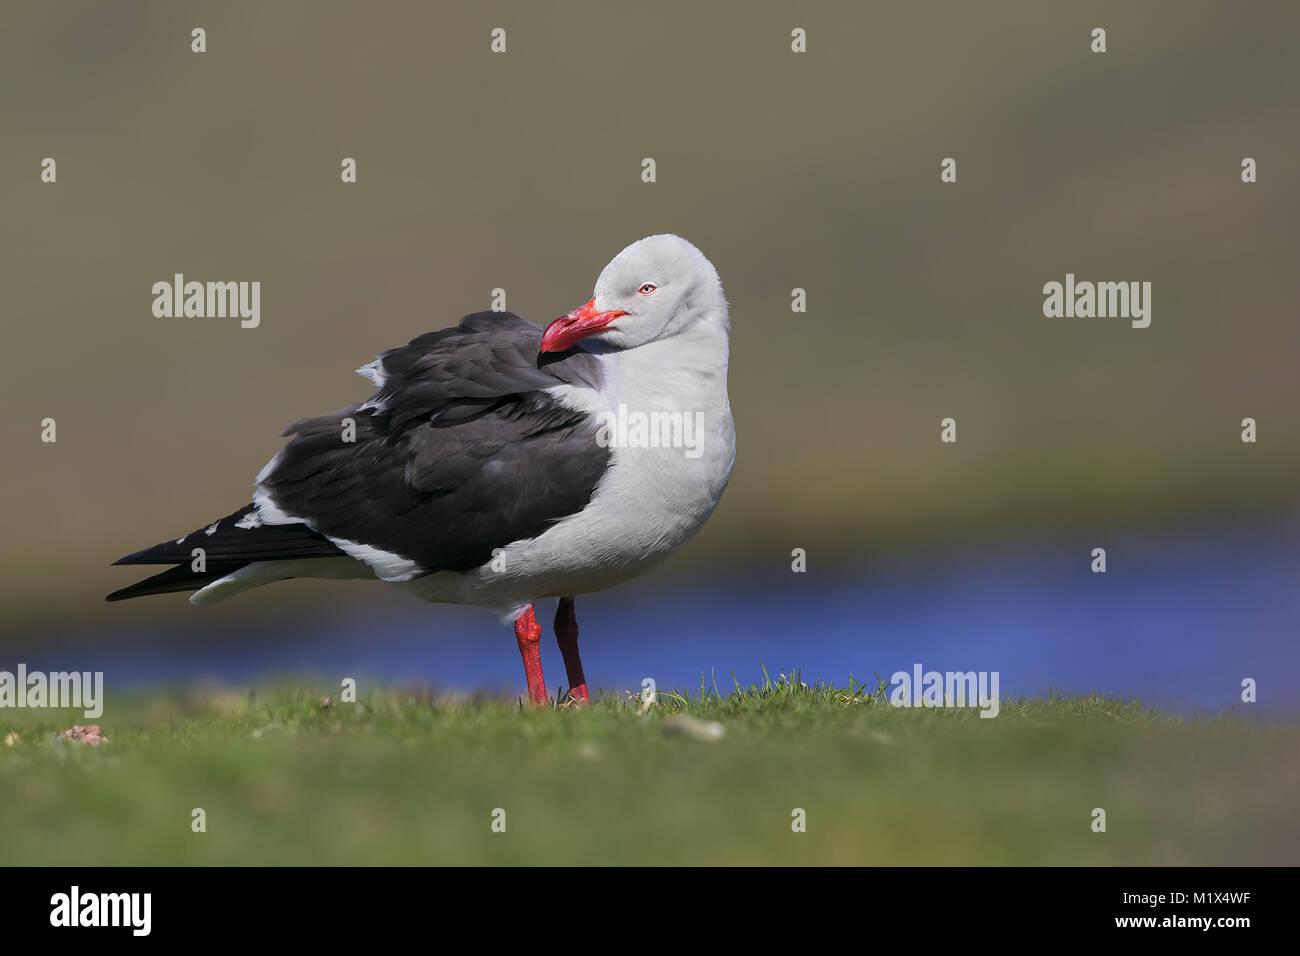 Dolphin gull - Stock Image